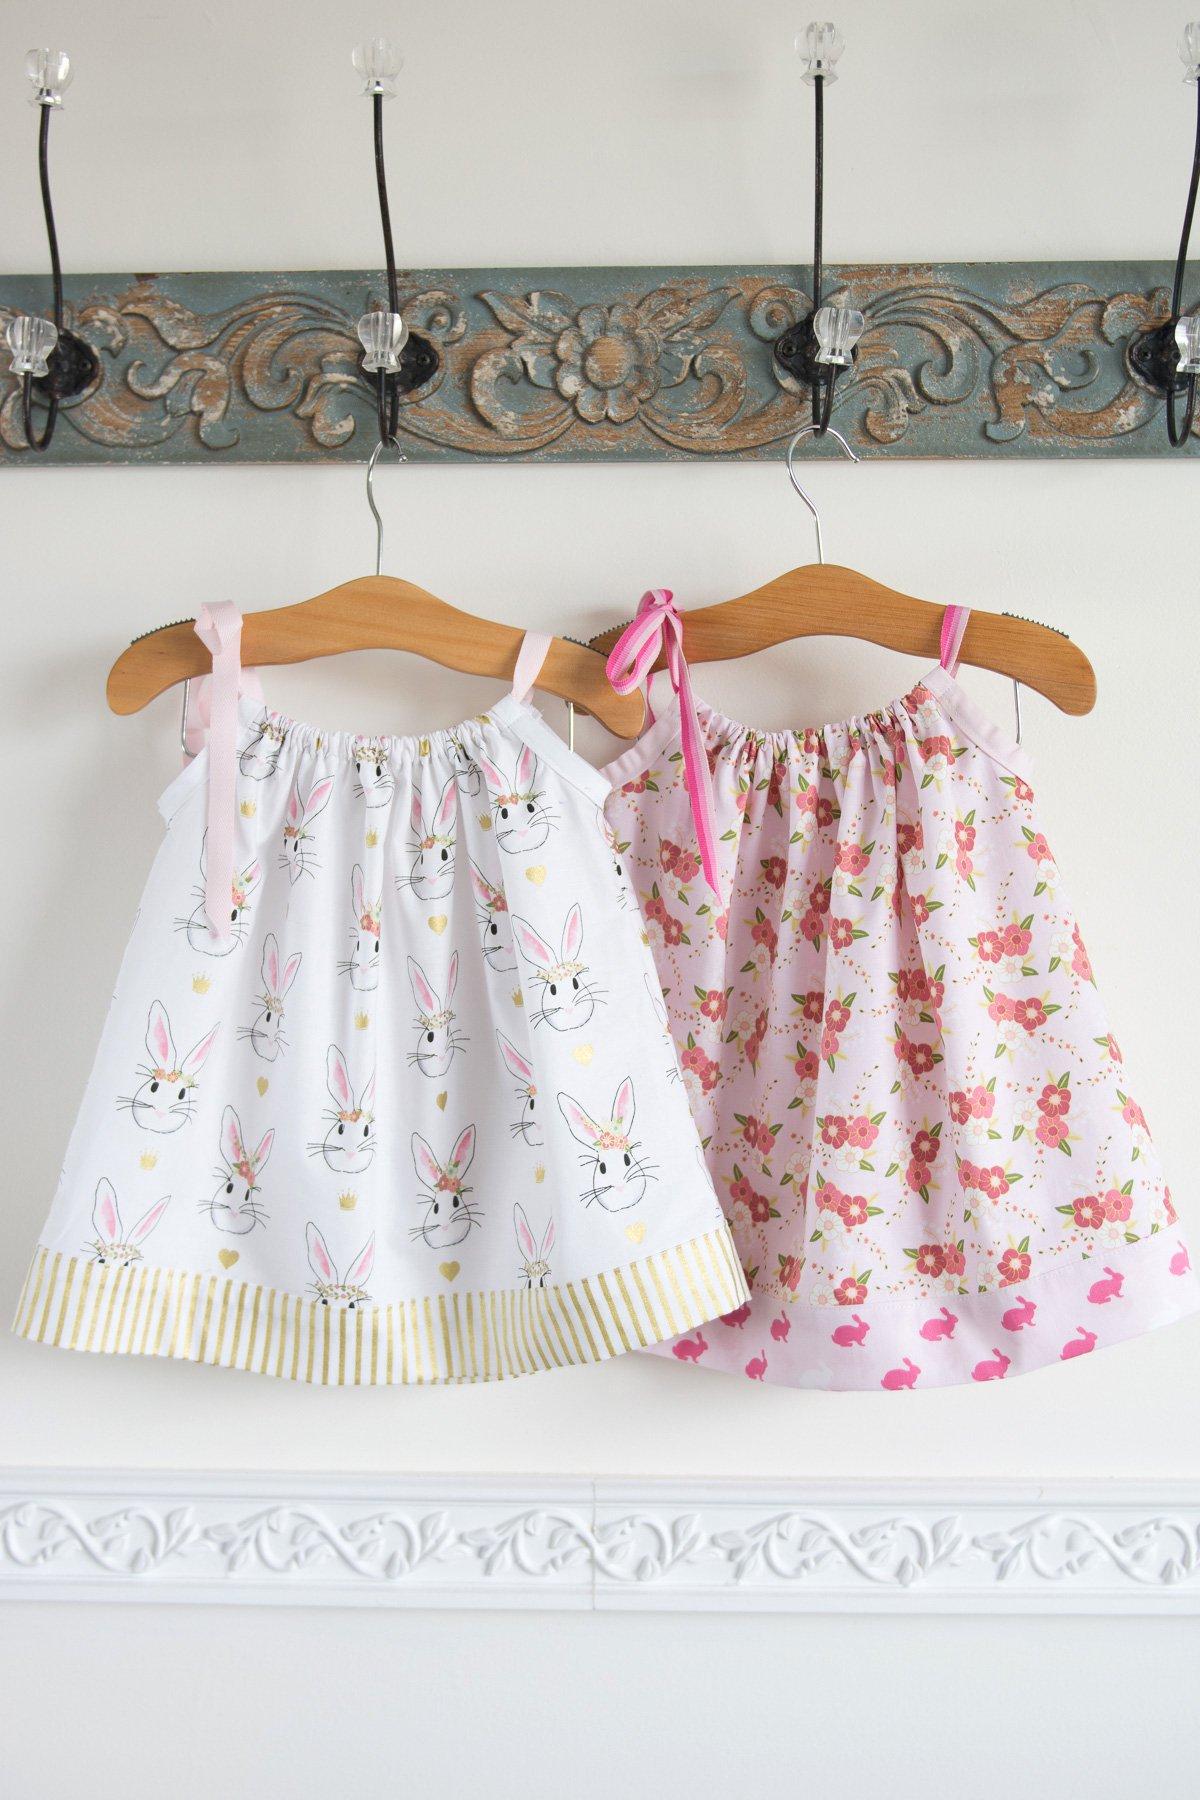 Pillowcase Dress Tutorial - The Polka Dot Chair - Free Printable Pillowcase Dress Pattern